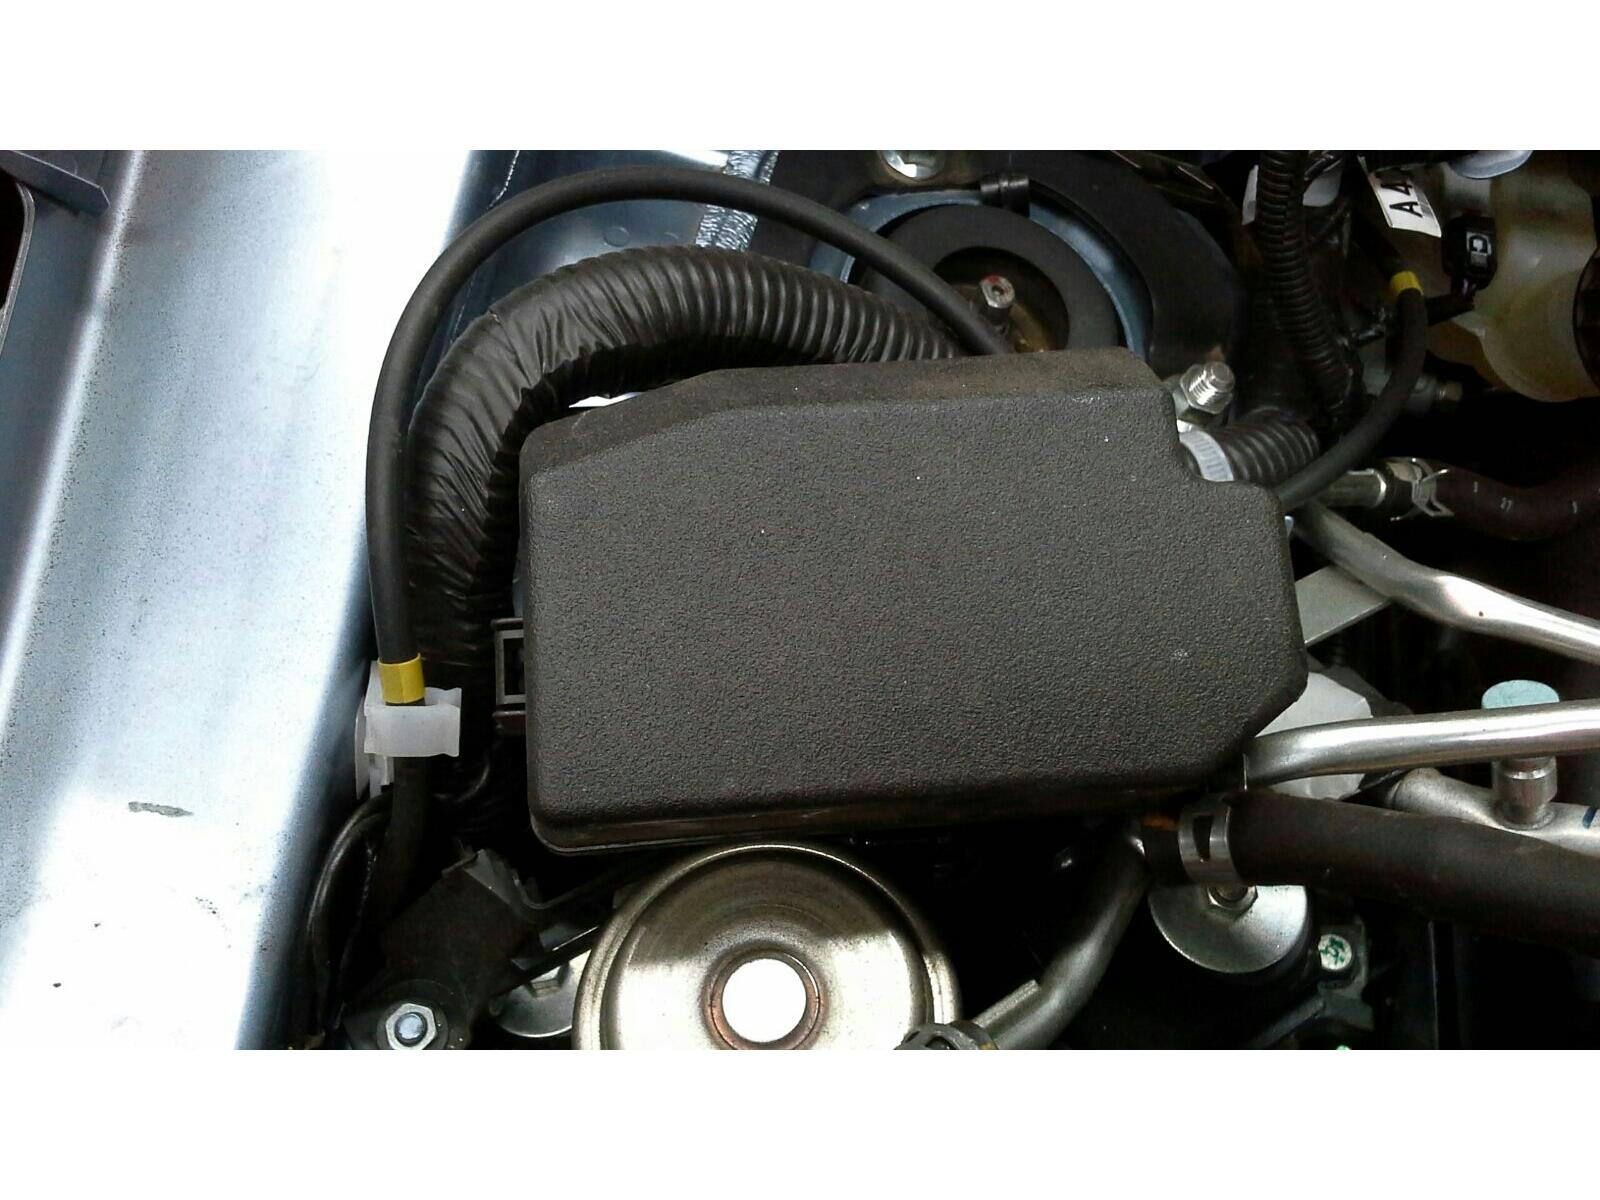 ... 2015 Mitsubishi Outlander - Fuse Box / Relay Board - 1300275